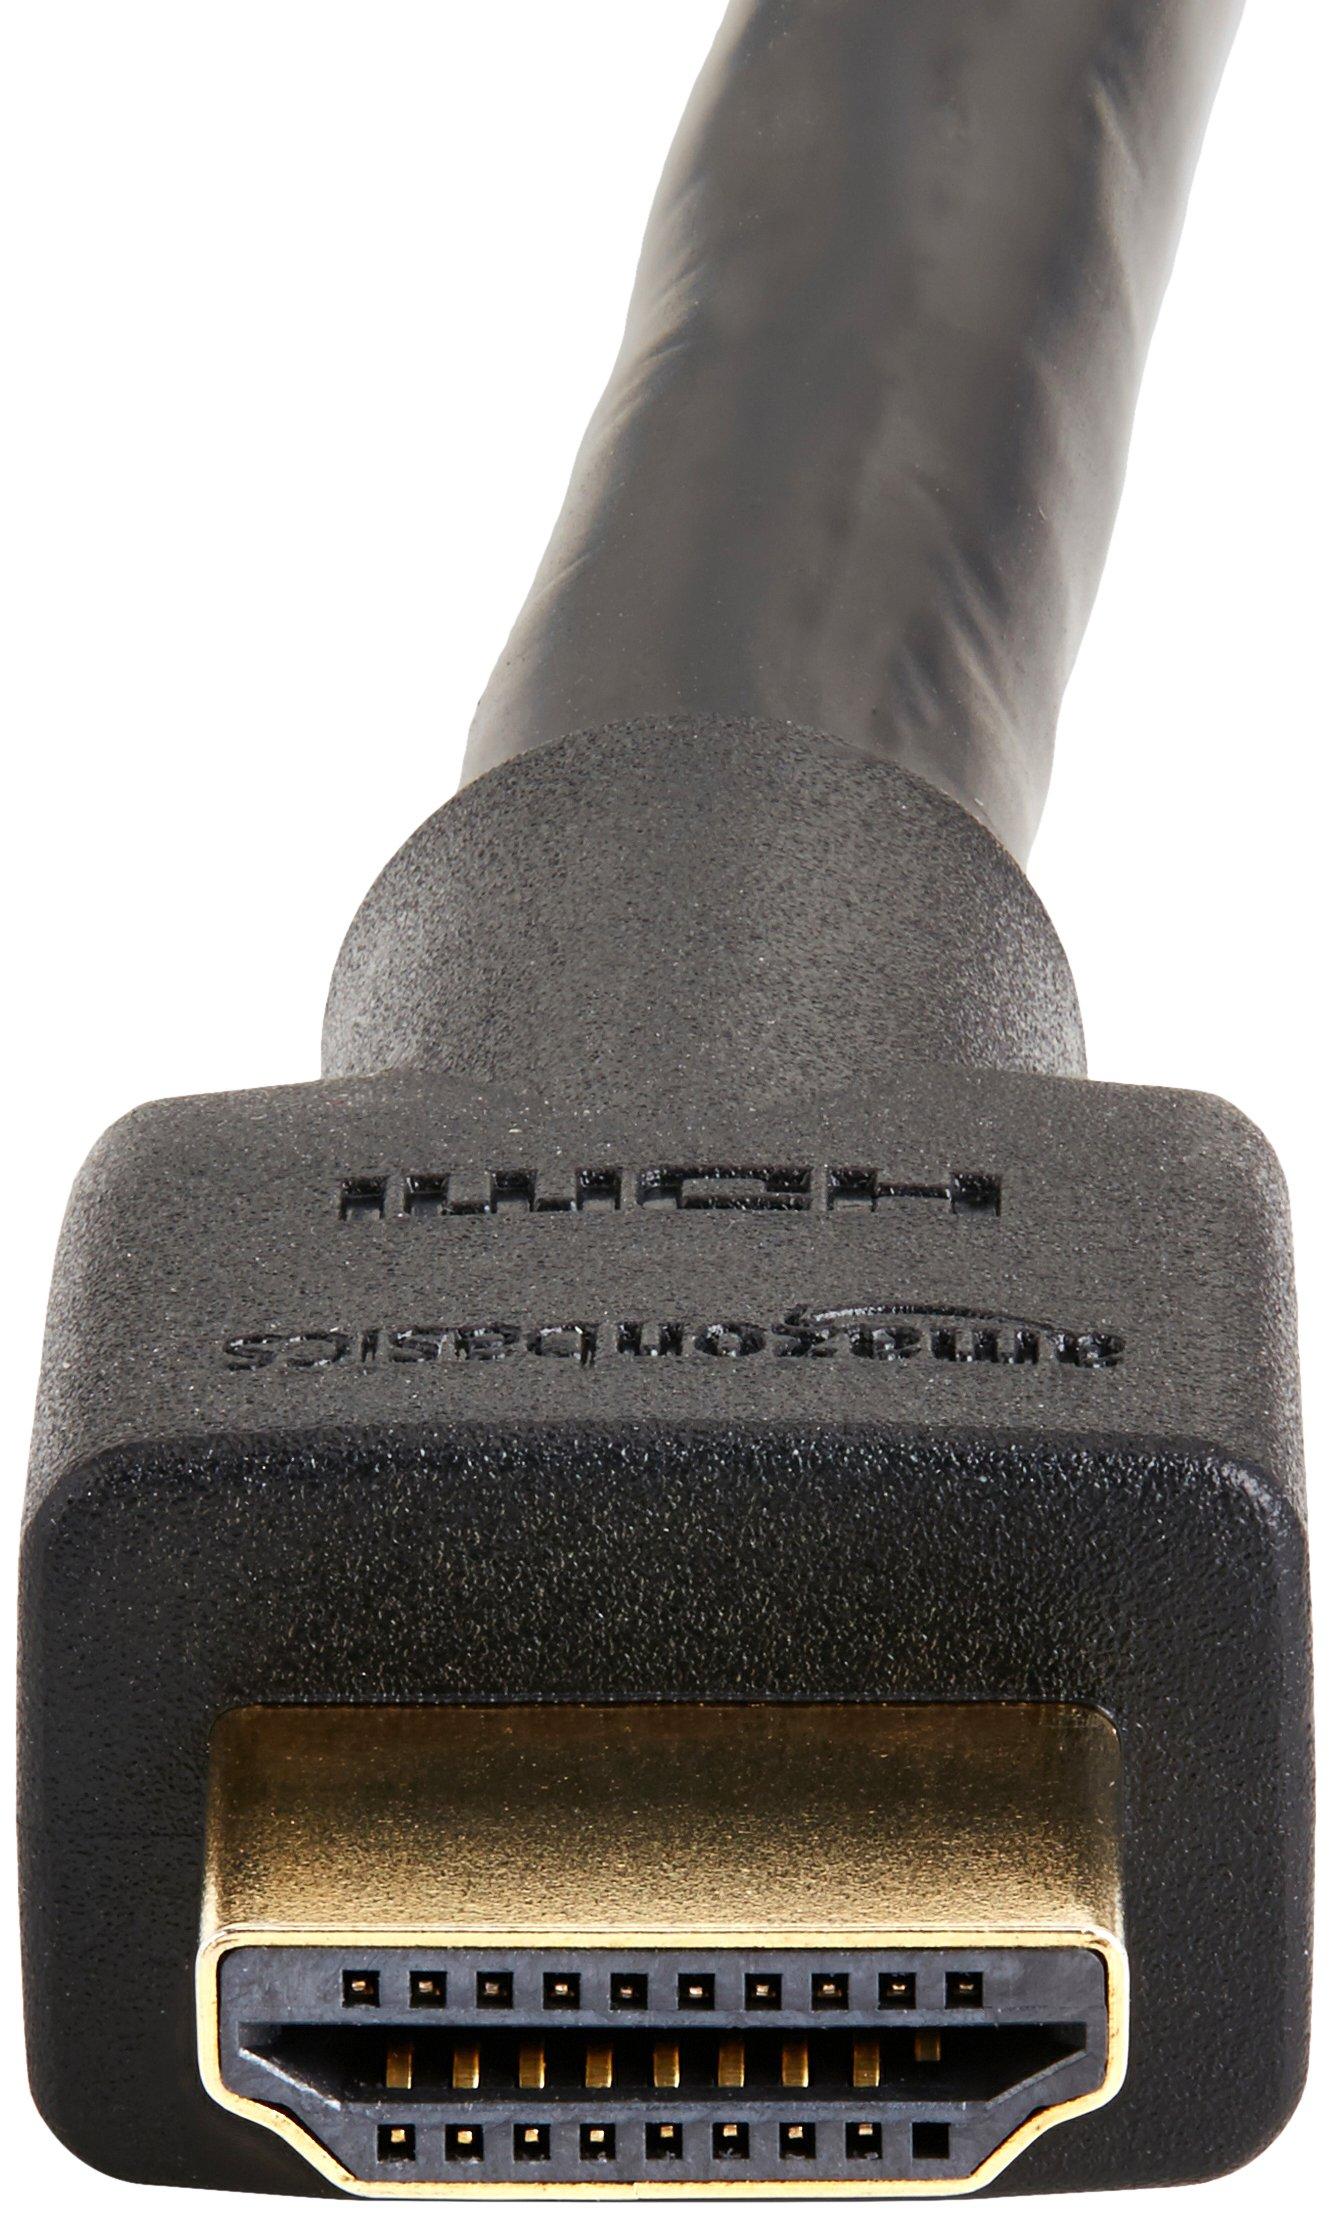 AmazonBasics TC4E_5 High-Speed HDMI Cable, 25 Feet, 5-Pack by AmazonBasics (Image #4)